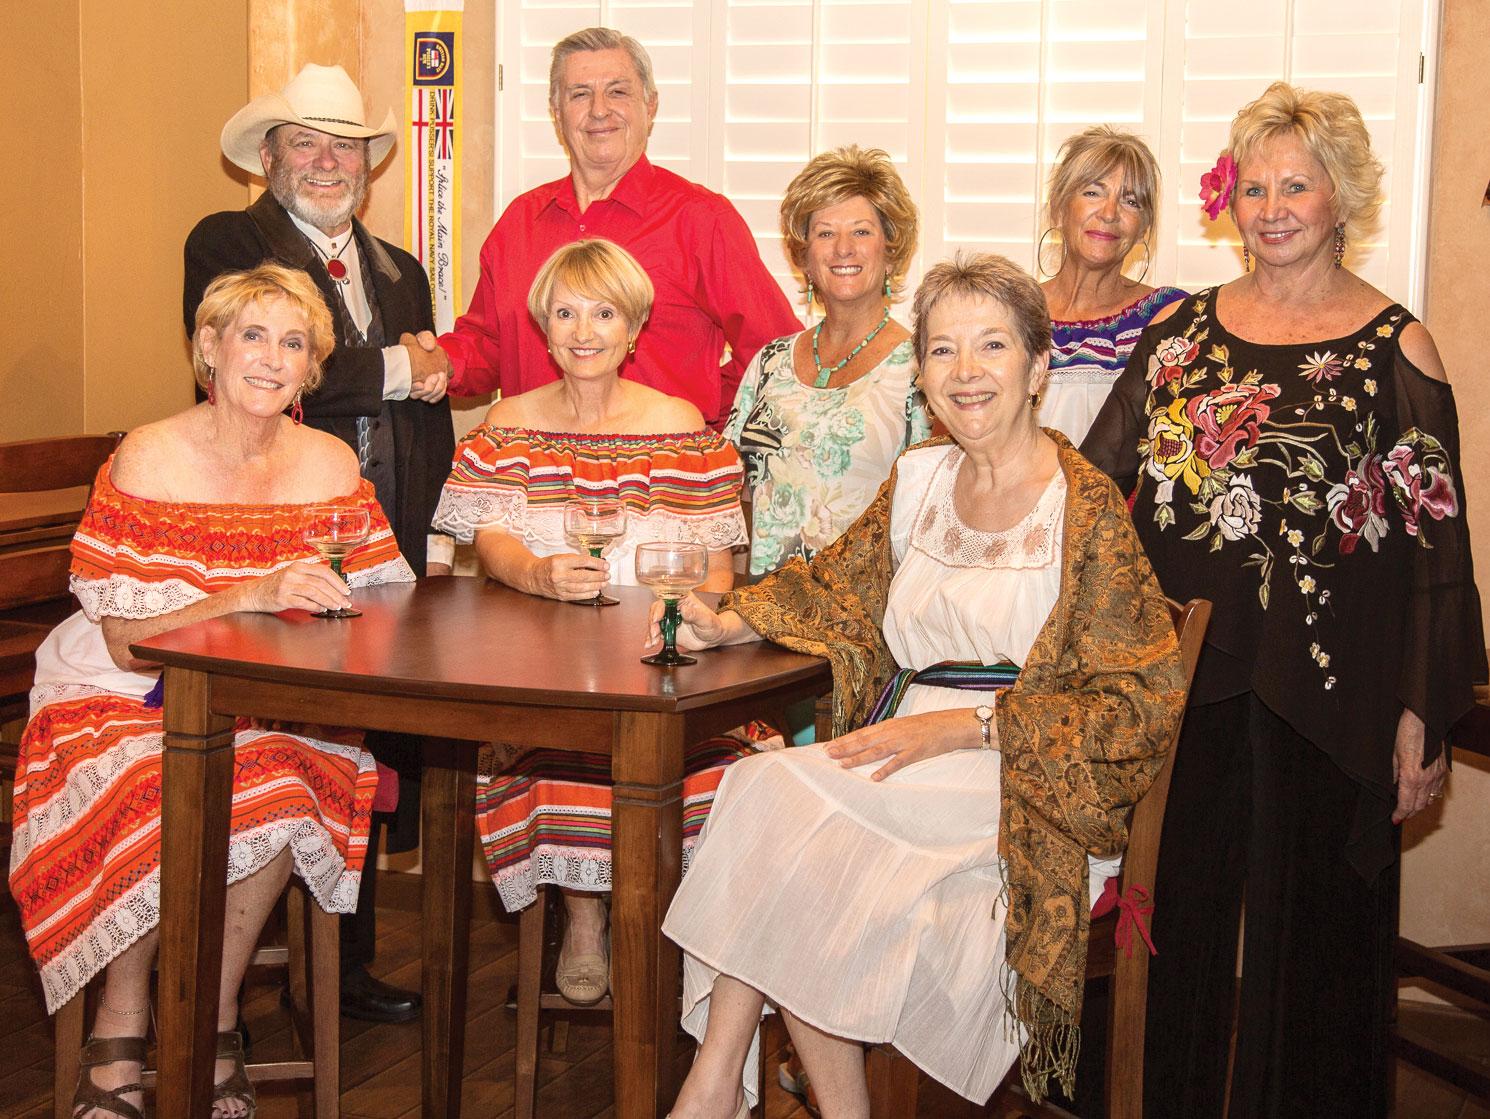 Jalapeno cast, seated: Sandi Hrovatin, Pam Campbell, Christine Bohannon; standing: Ray Hebert, Davey Jones, Mary Campbell-Jones, Claudia Andrews, Cyndy Gierada; photograph courtesy of Jeff Krueger